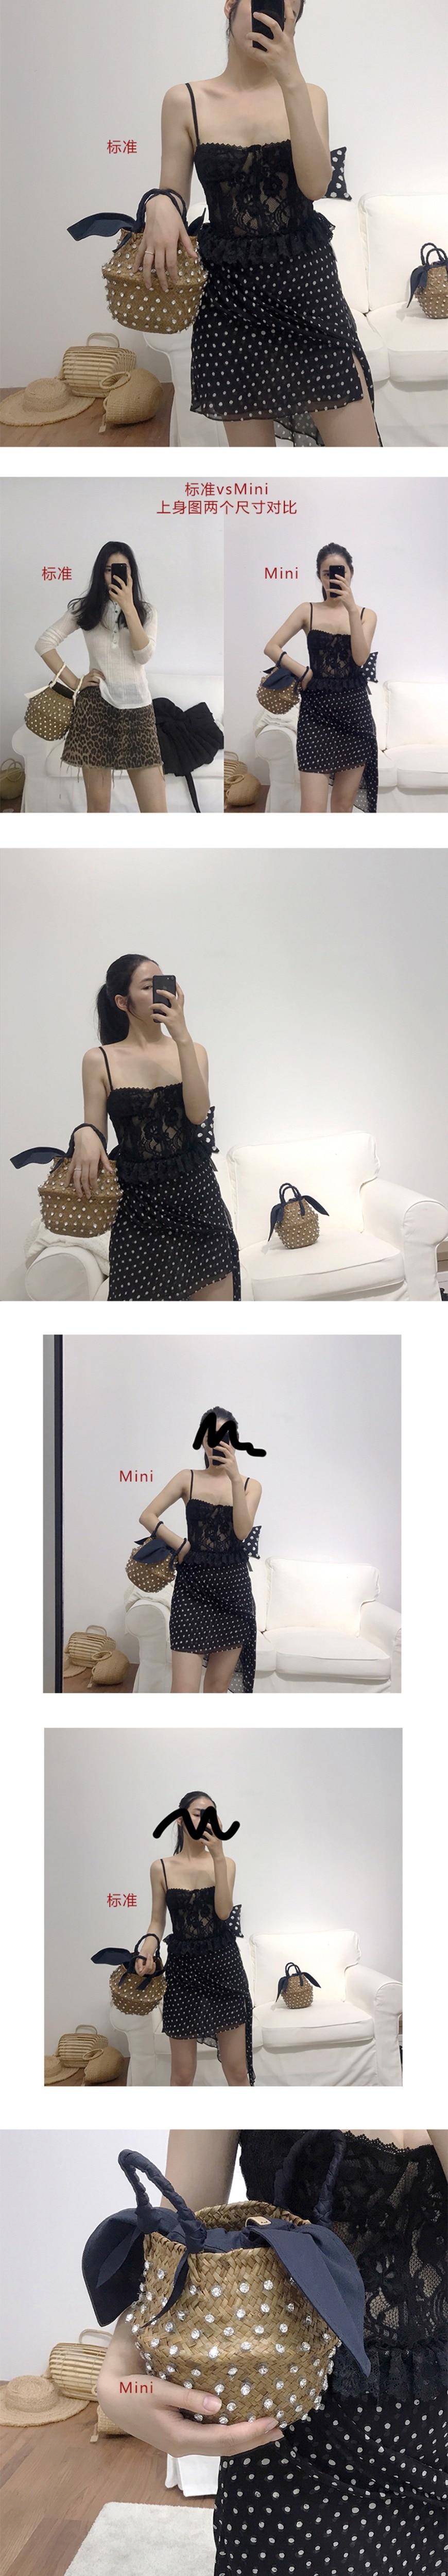 STRAW BAG (1)